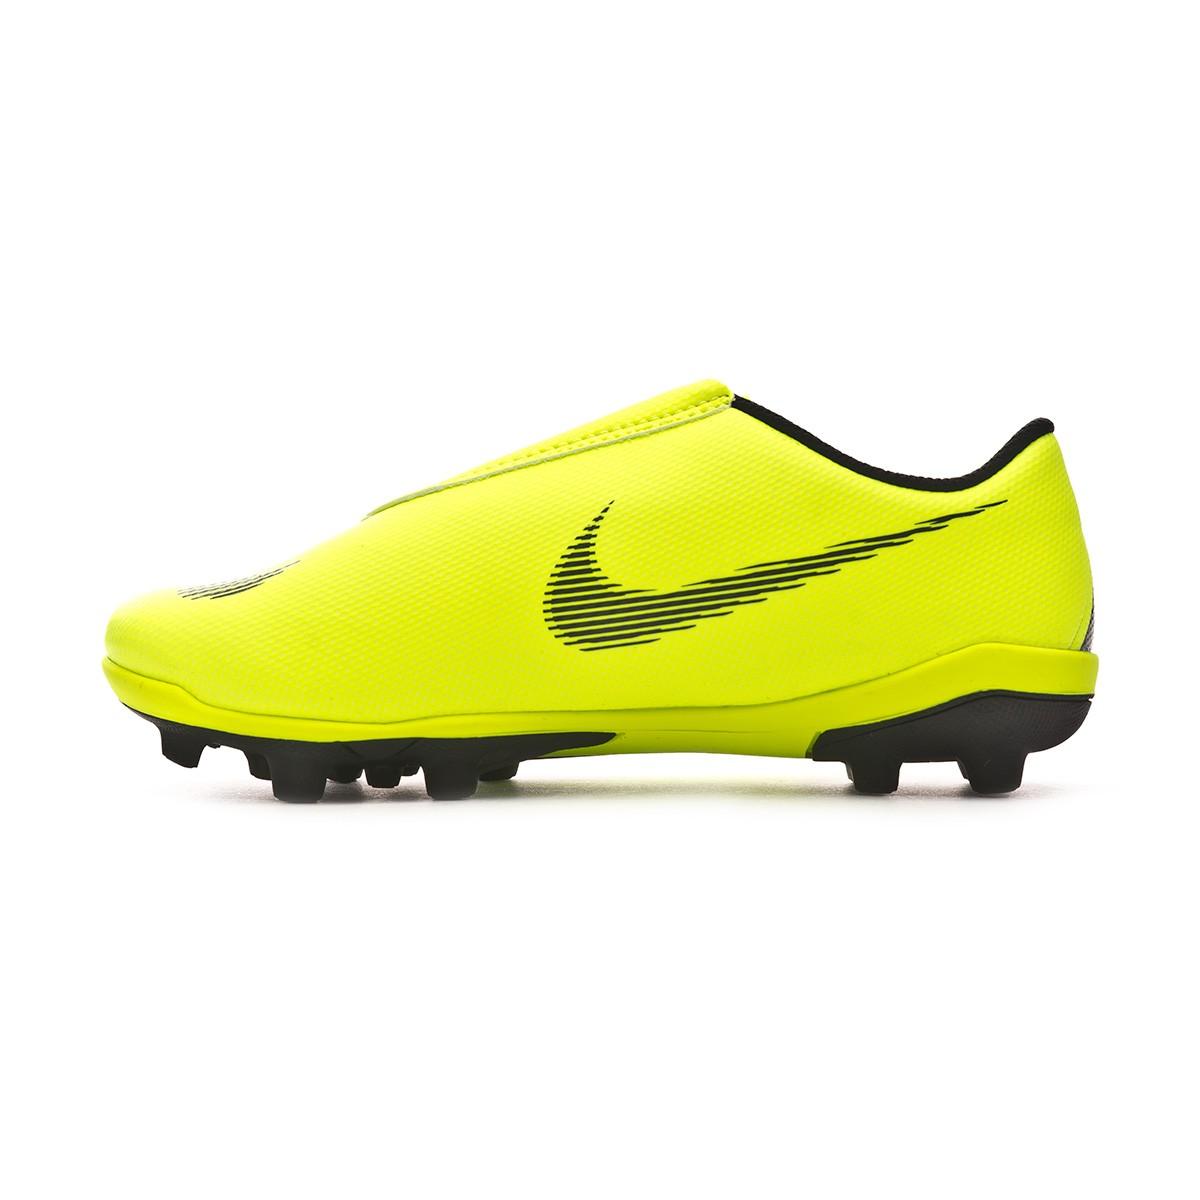 fa4c13ceb5d Football Boots Nike Kids Mercurial Vapor XII Club MG Volt-Black - Football  store Fútbol Emotion